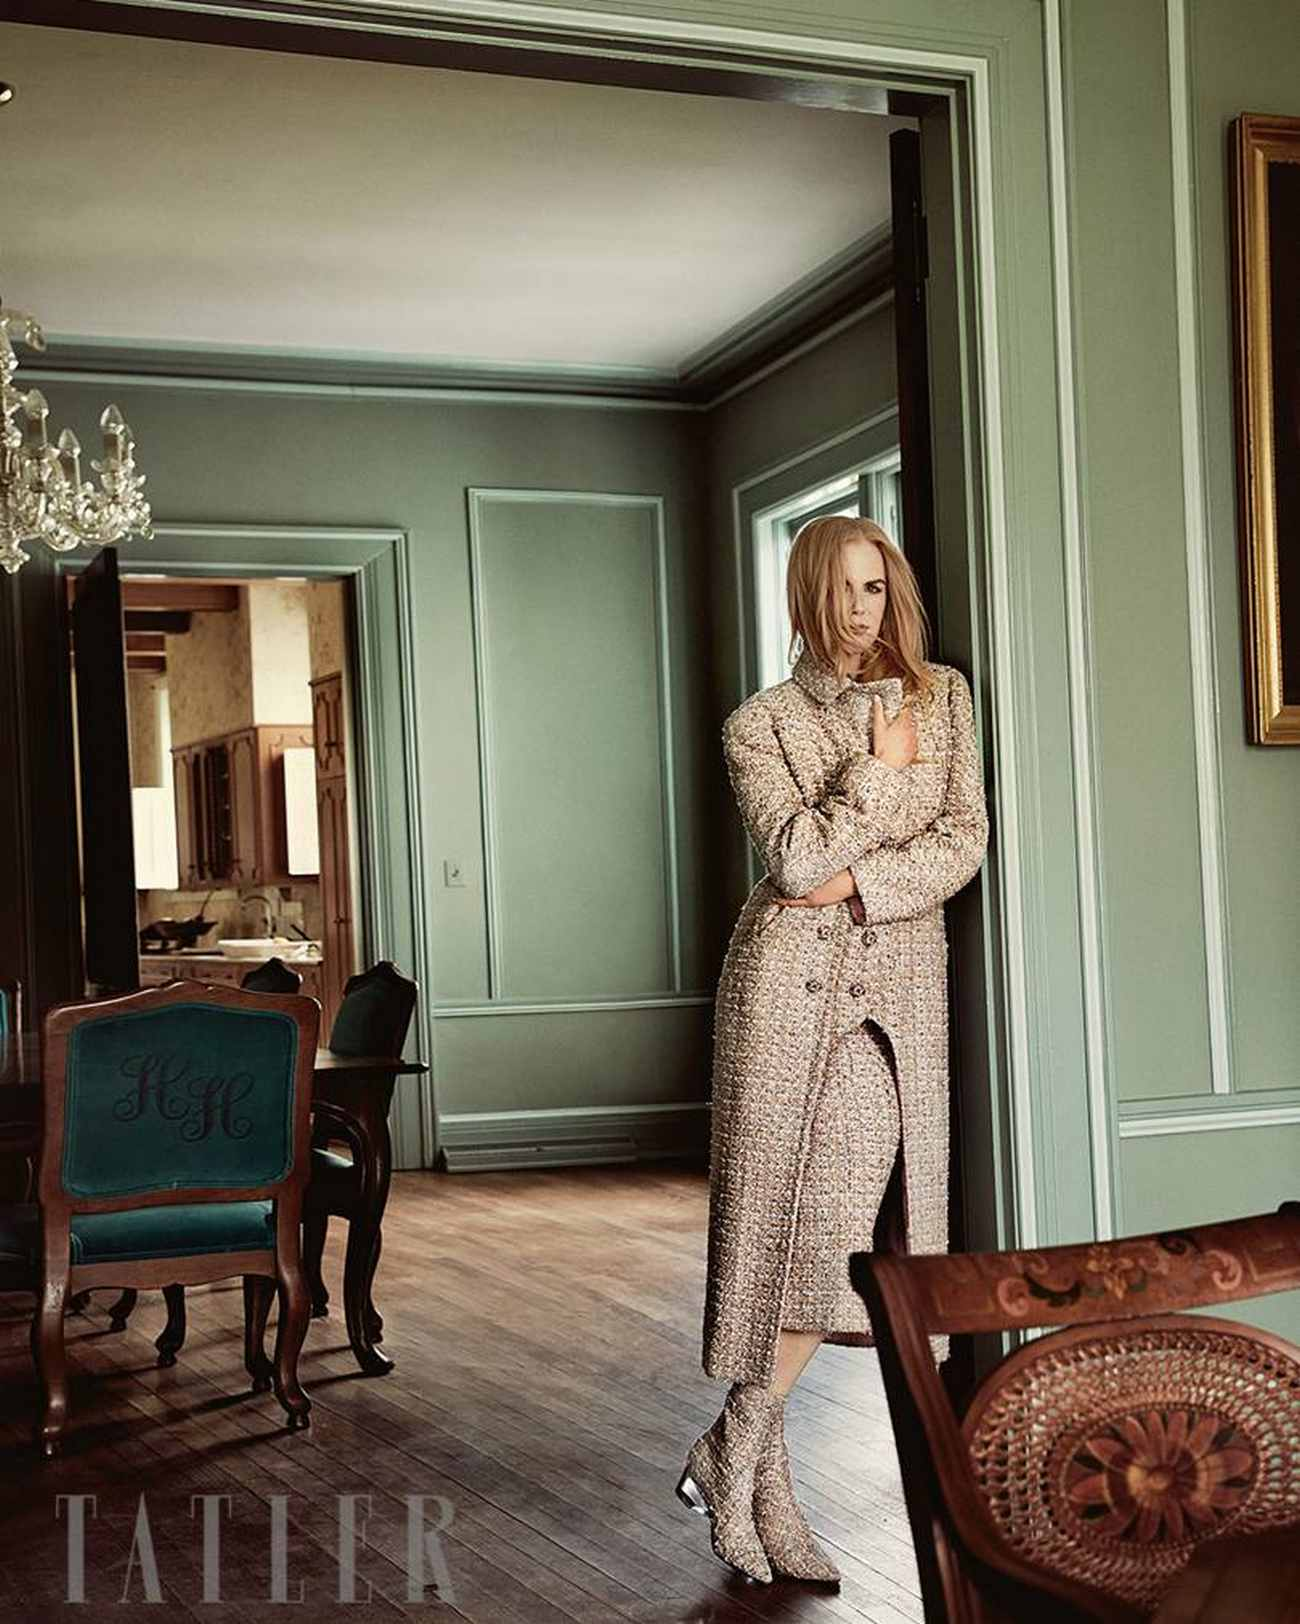 Nicole-Kidman-Tatler-July-201800004.jpg